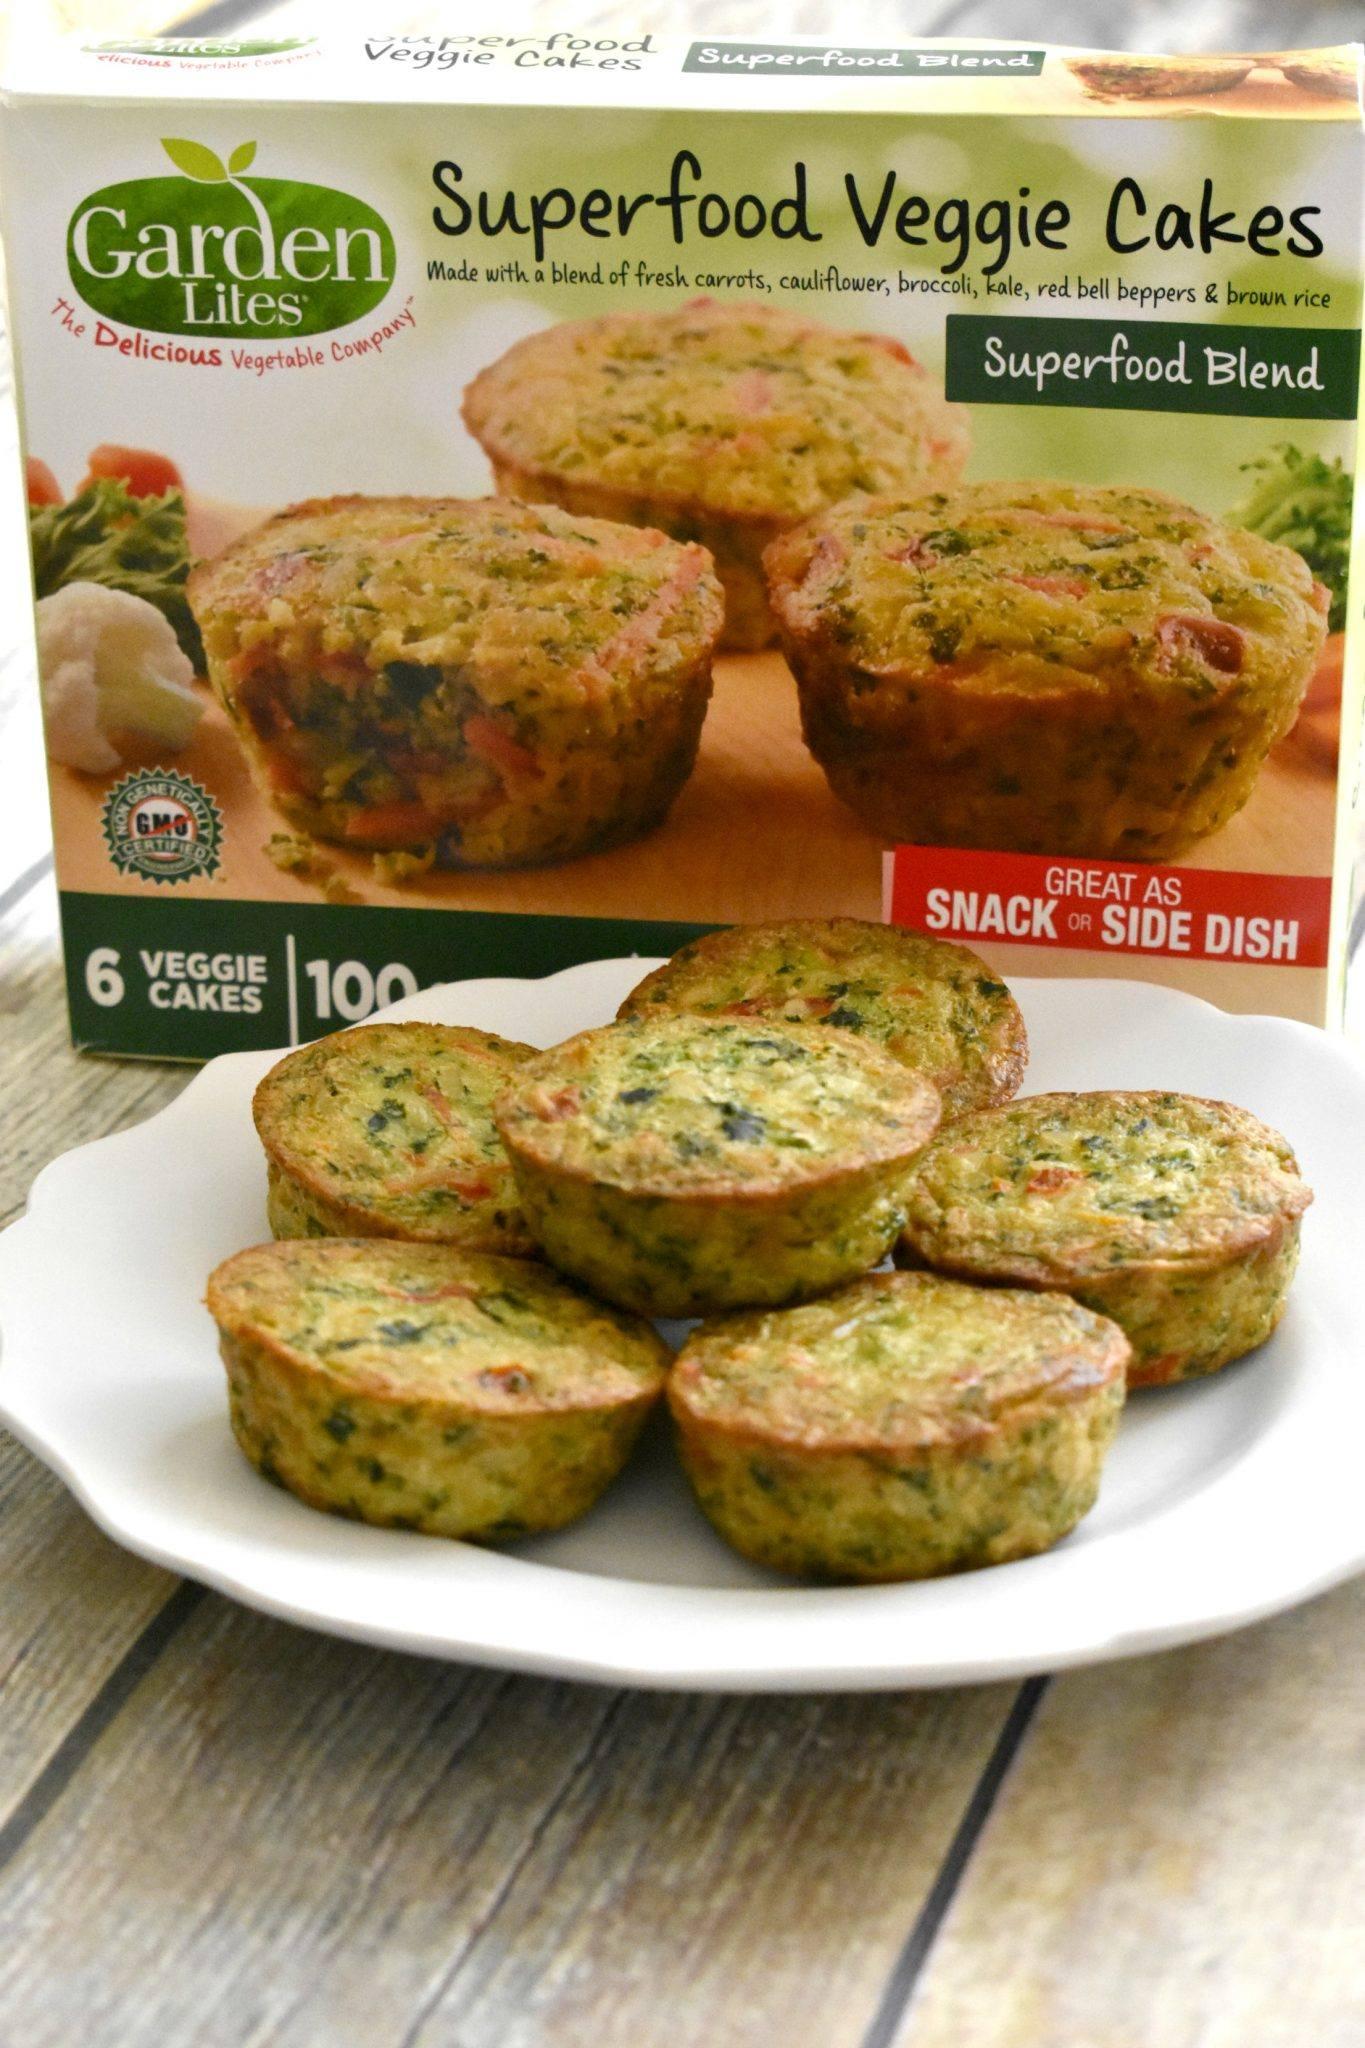 Garden Lites Super Food Veggie Cakes Review - Living Freely Gluten Free